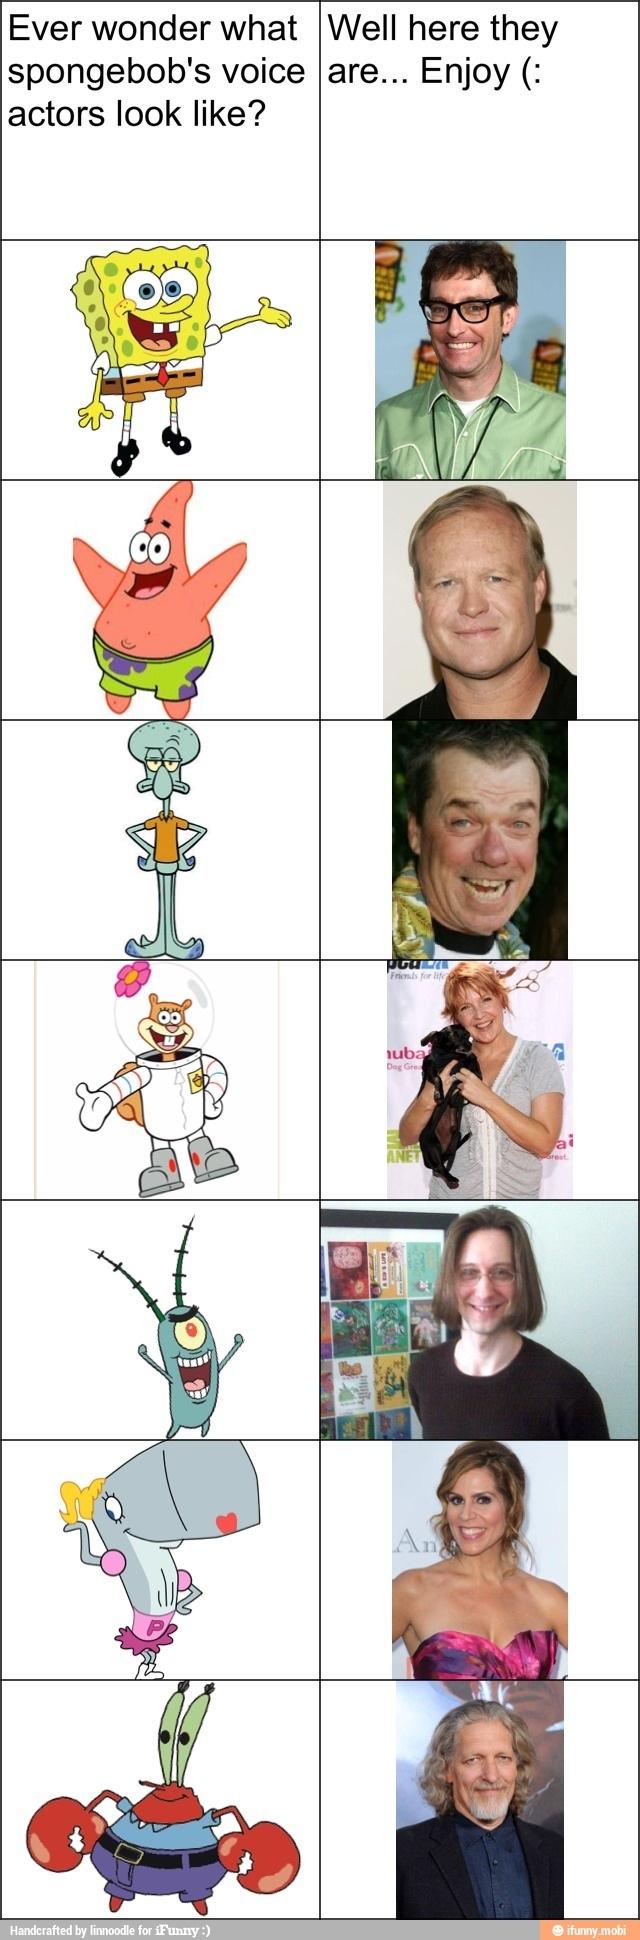 spongebob tom kenny patrick bill fagerbakke squidward roger